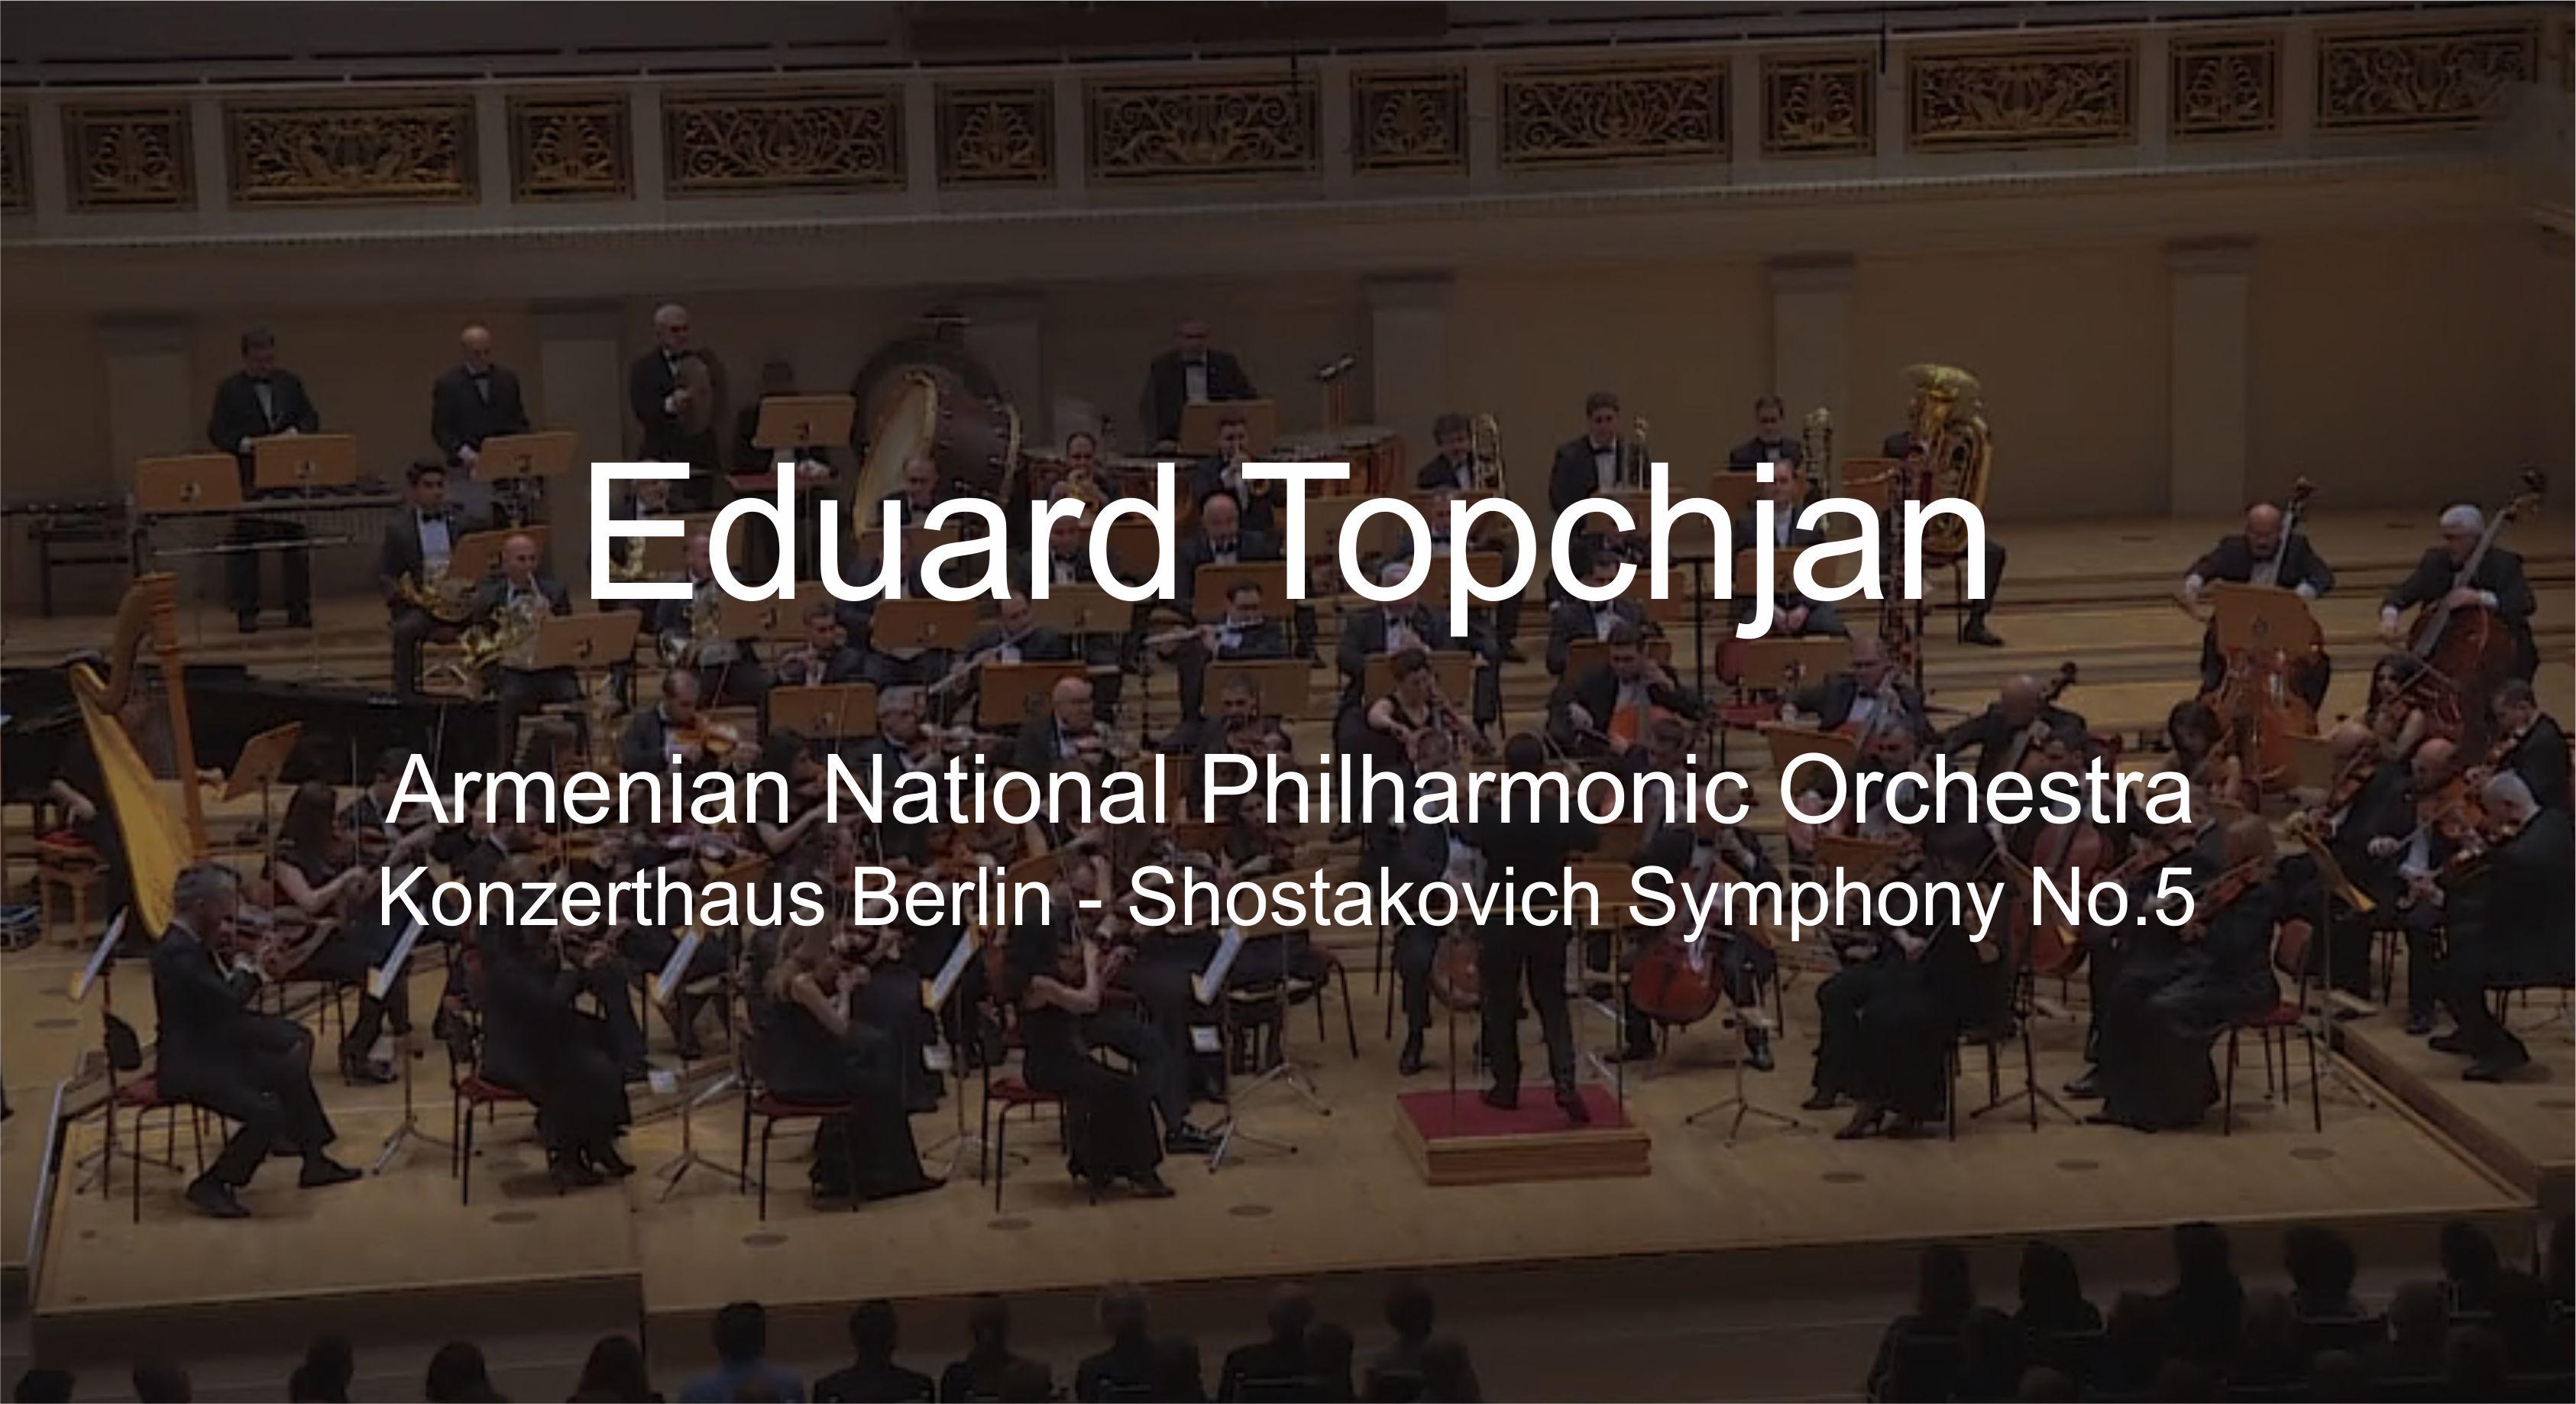 Shostakovich Symphony No.5, Berlin 2018